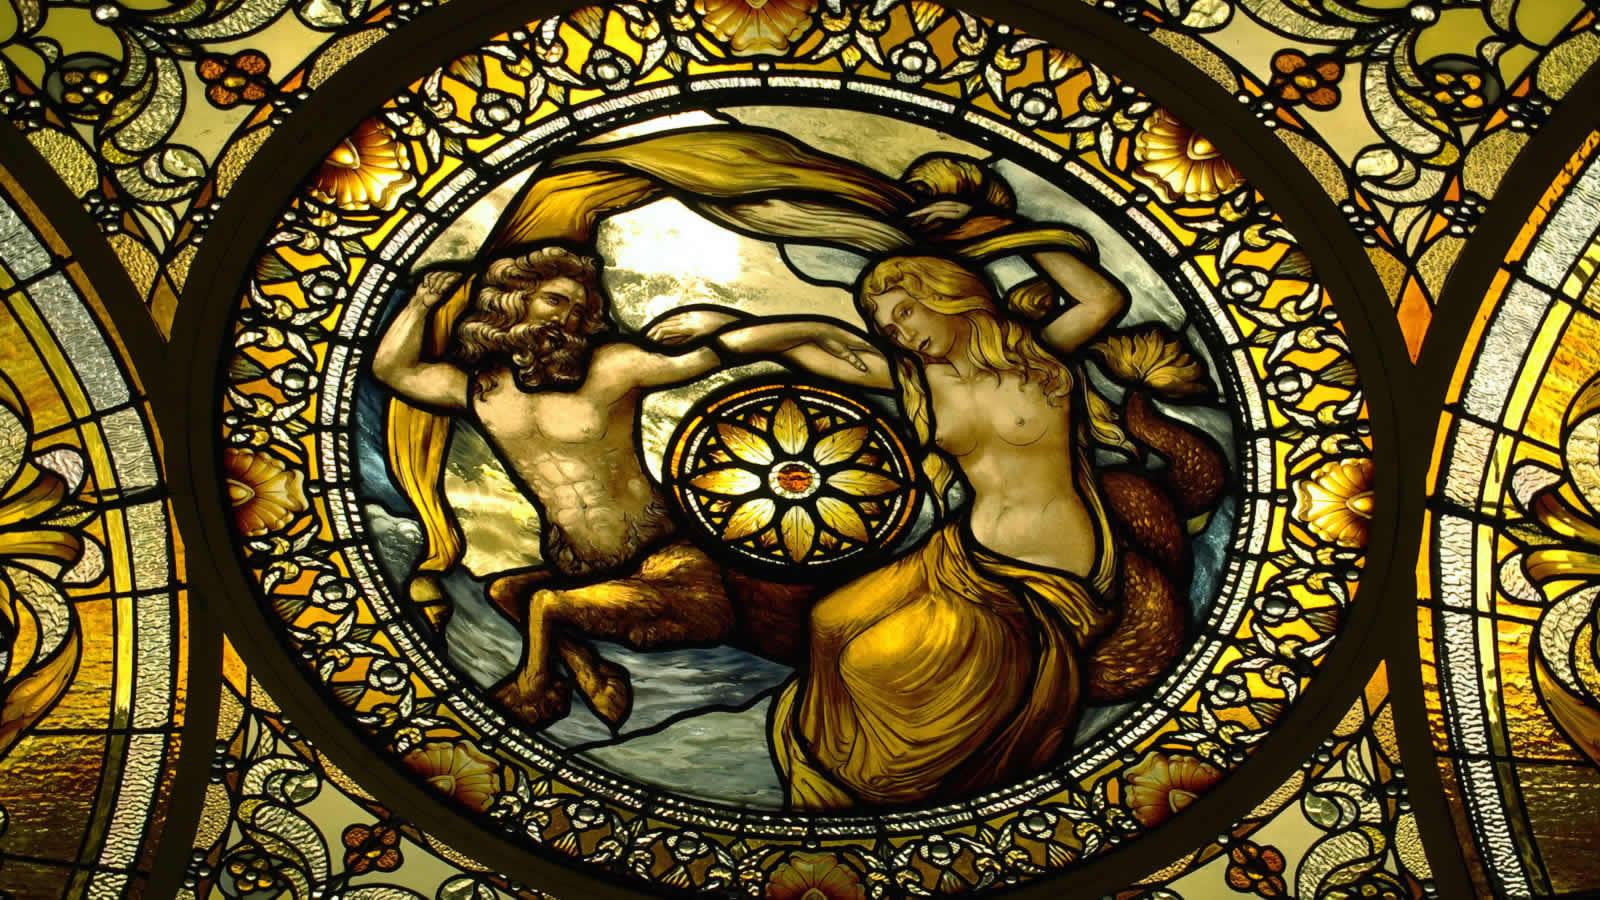 coupole-Saint-petersbourg-dome-en-vitraux-eric-bonte-france-vitrail-3.jpg